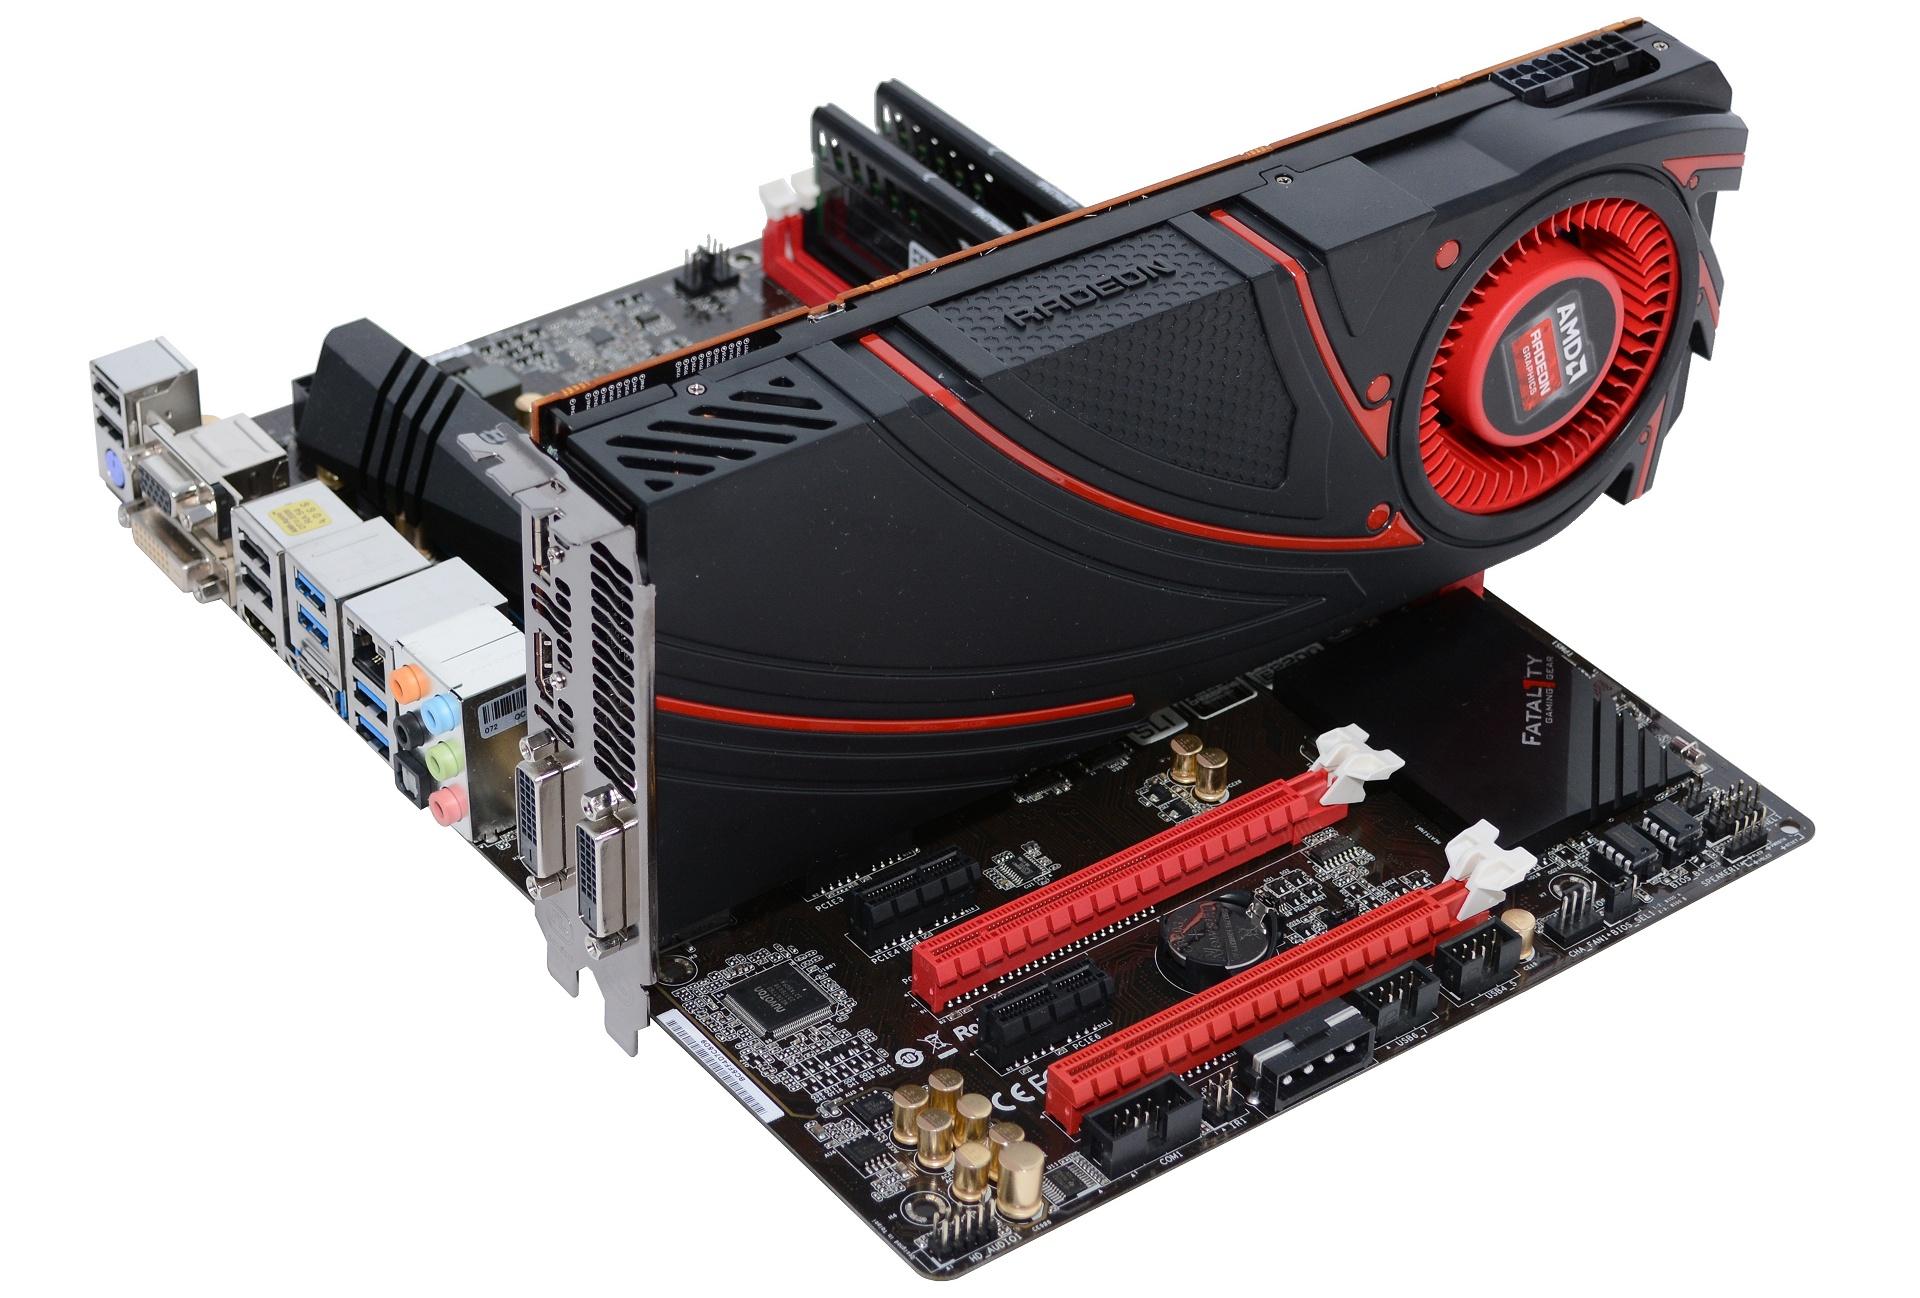 Amd Radeon R9 290 Review